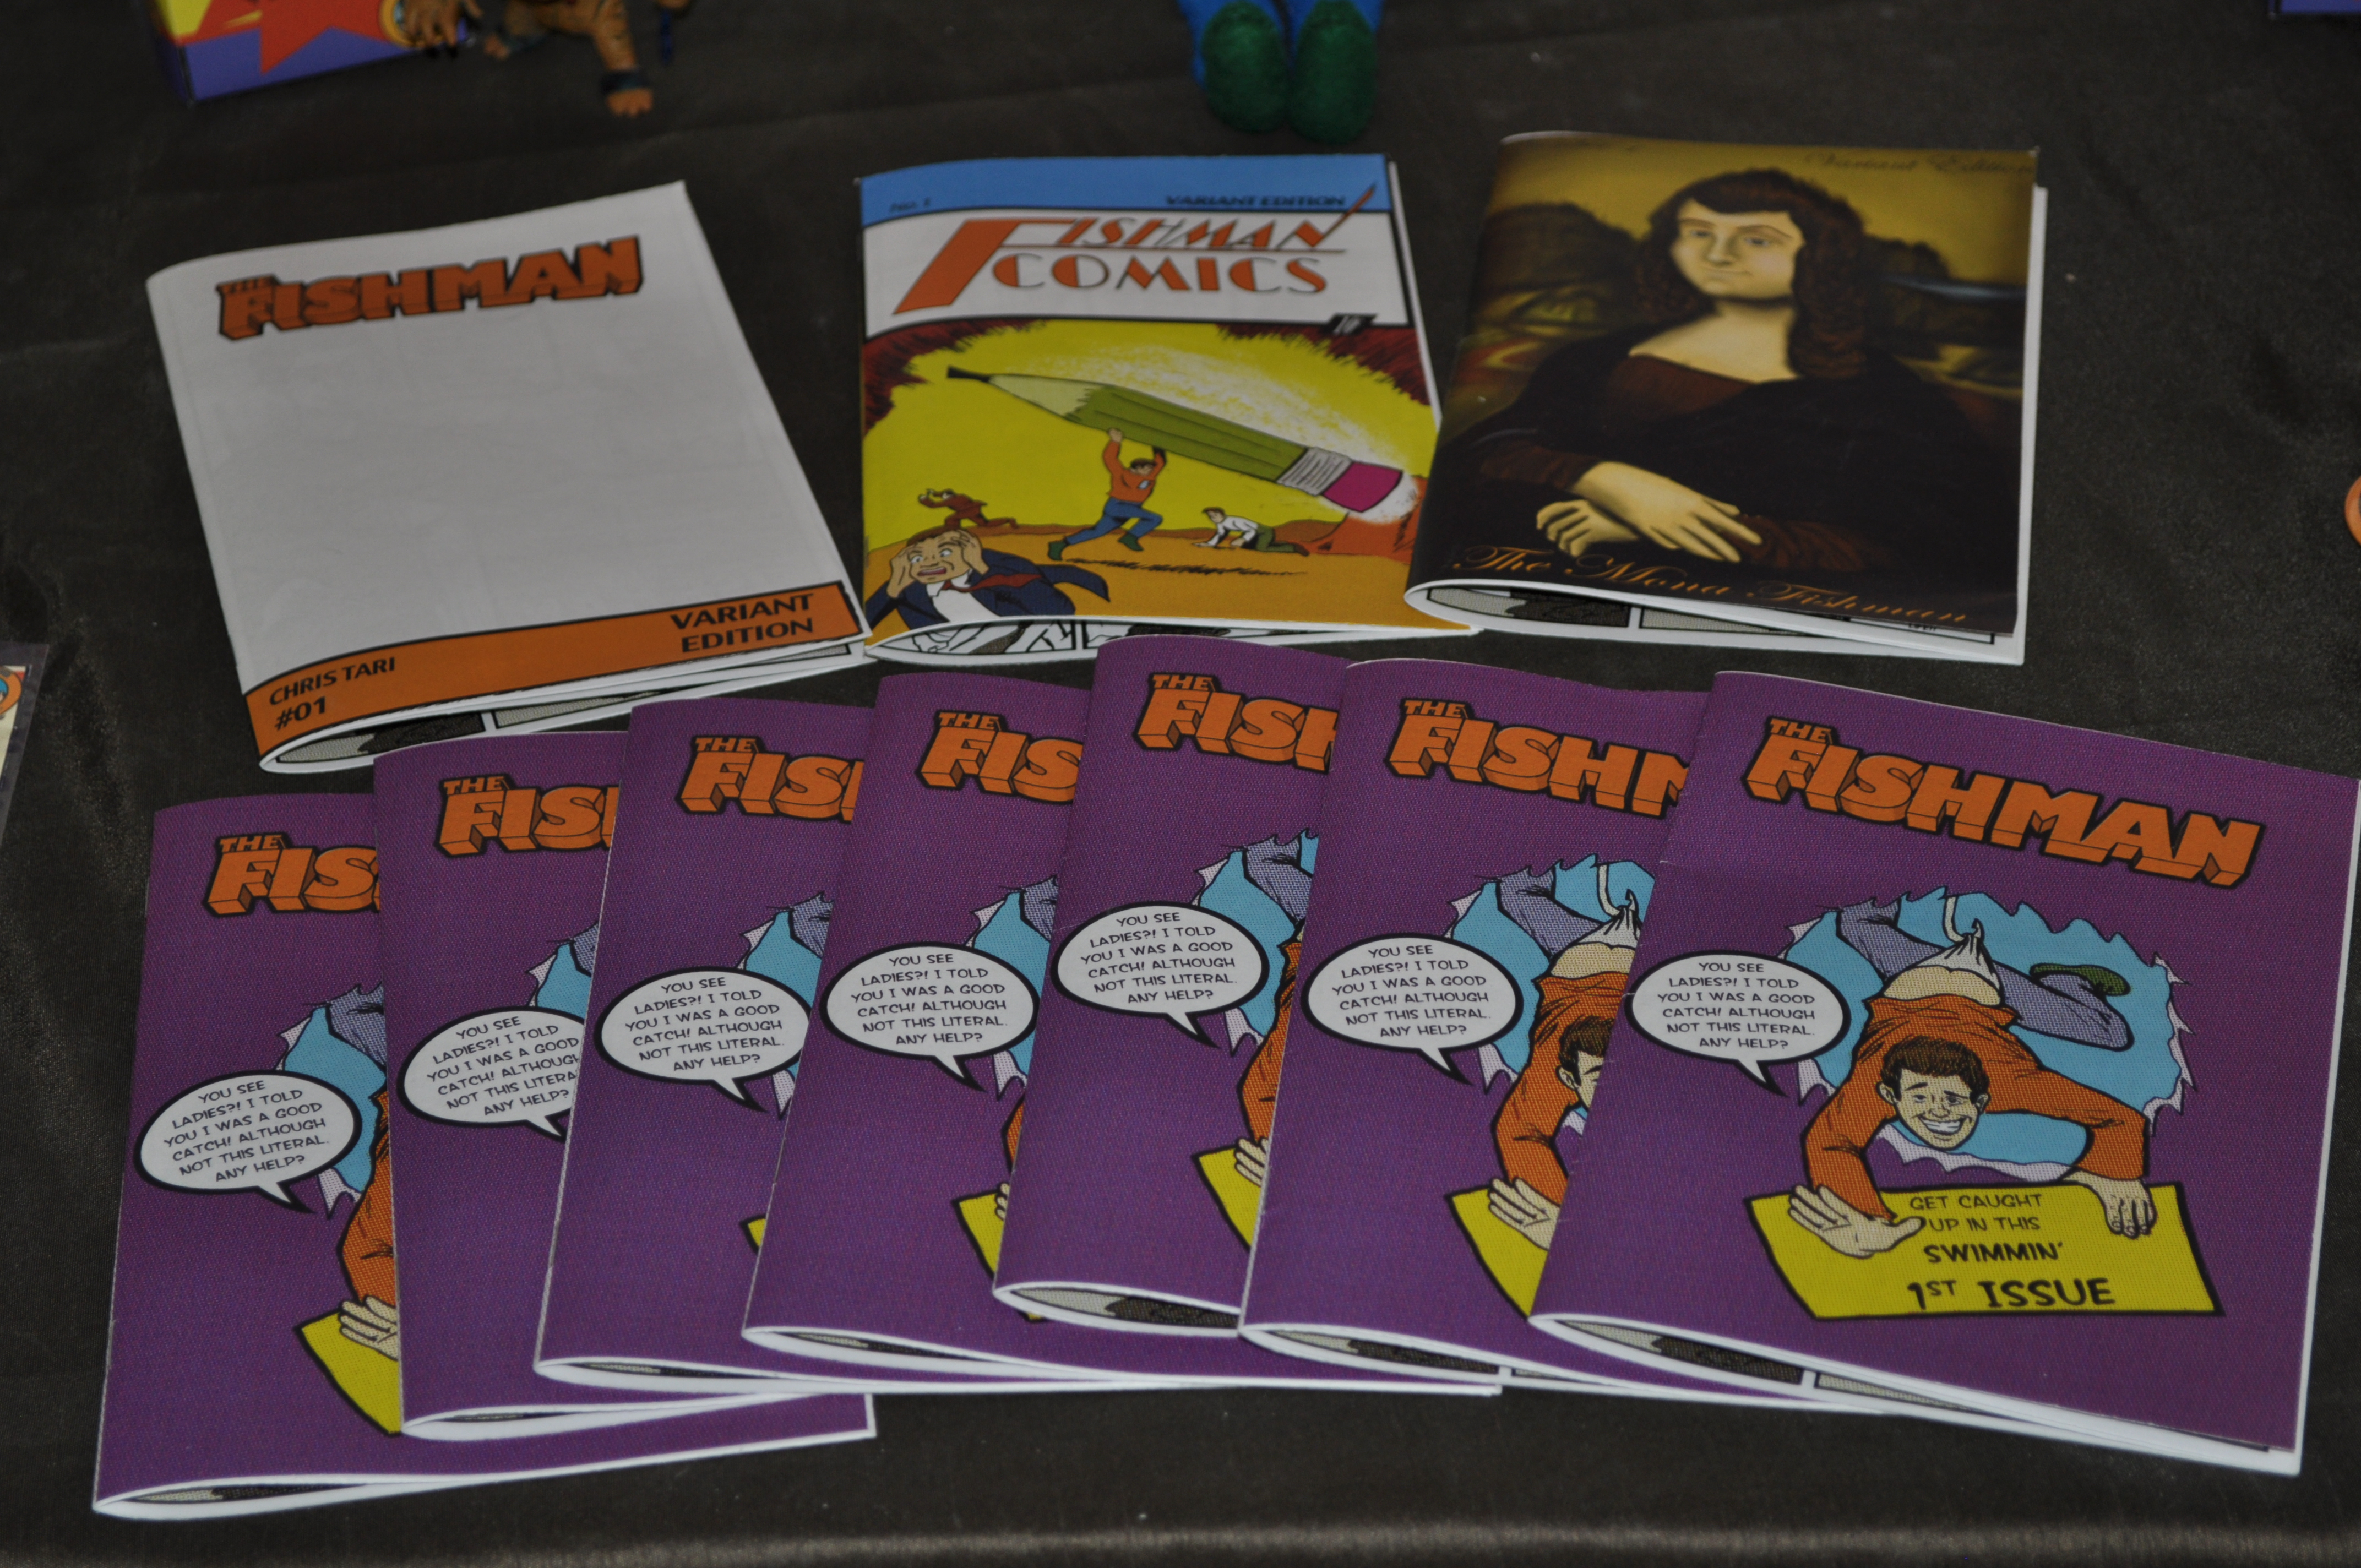 Fishman Comic and Variants #1